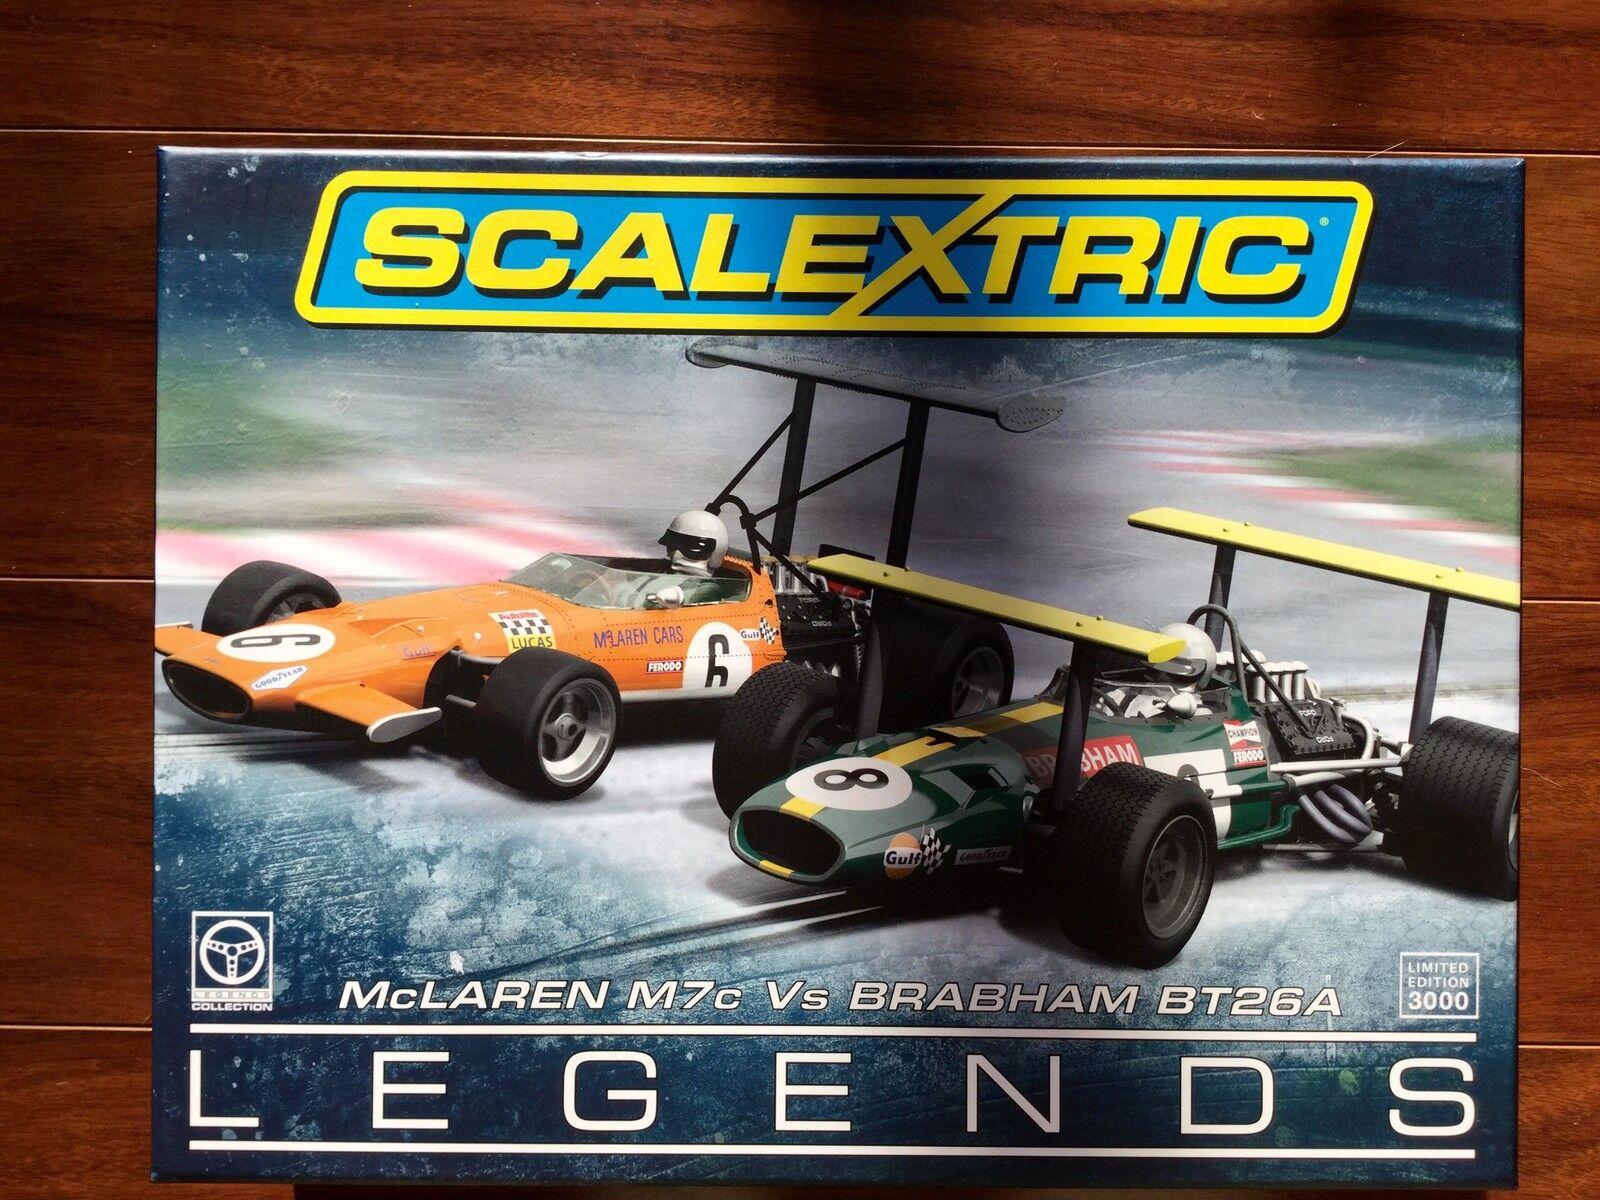 Scalextric 1/32 McLaren M7C vs Brabham BT26 Twin Pack como nuevo artículo en caja C3589A F/S